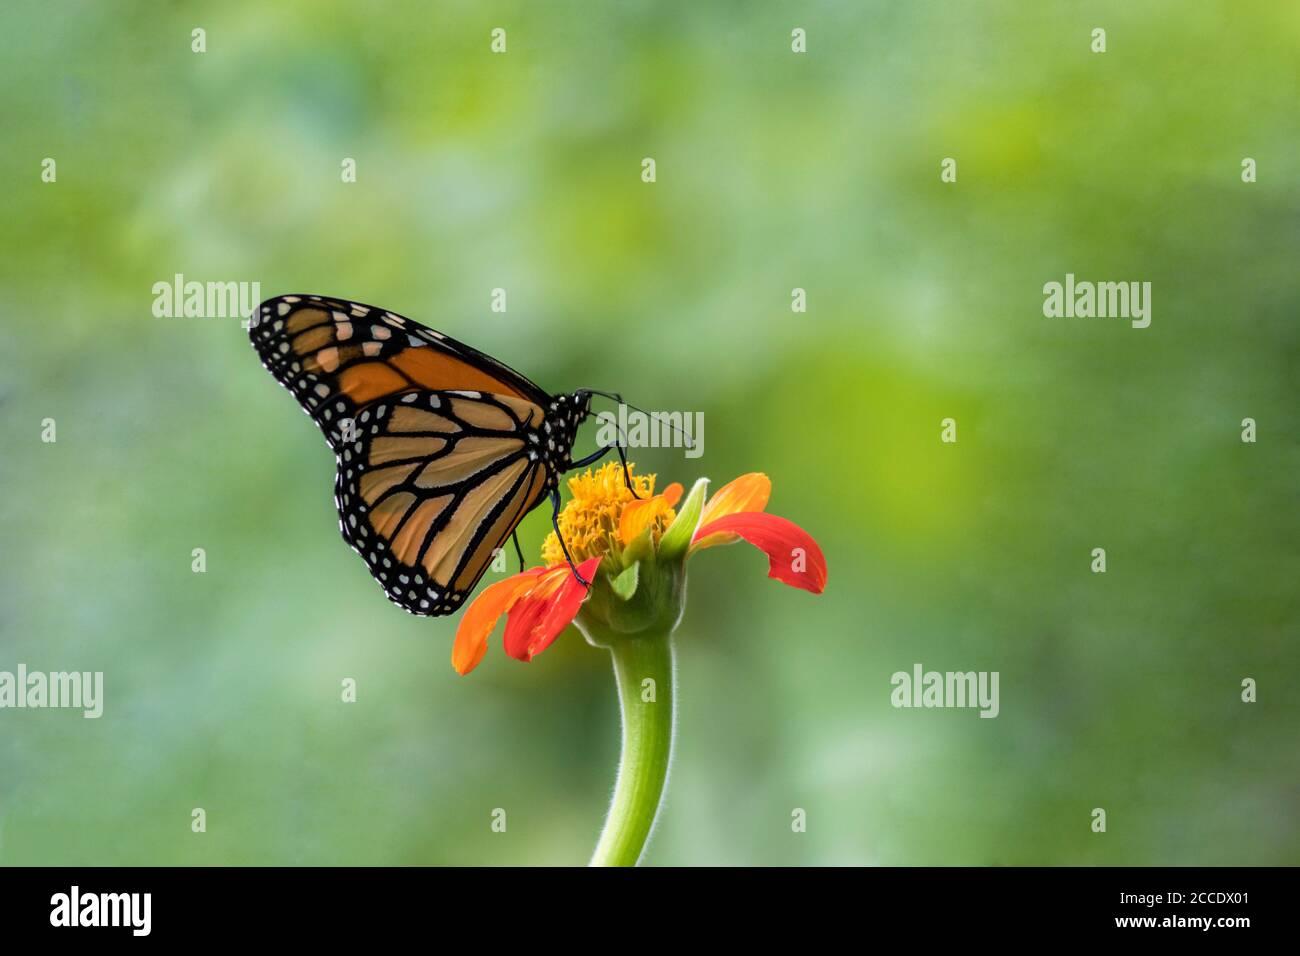 Monarch Butterfly, Danaus plexippuson, on orange Mexican Sunflower, Tithonia, green background Stock Photo